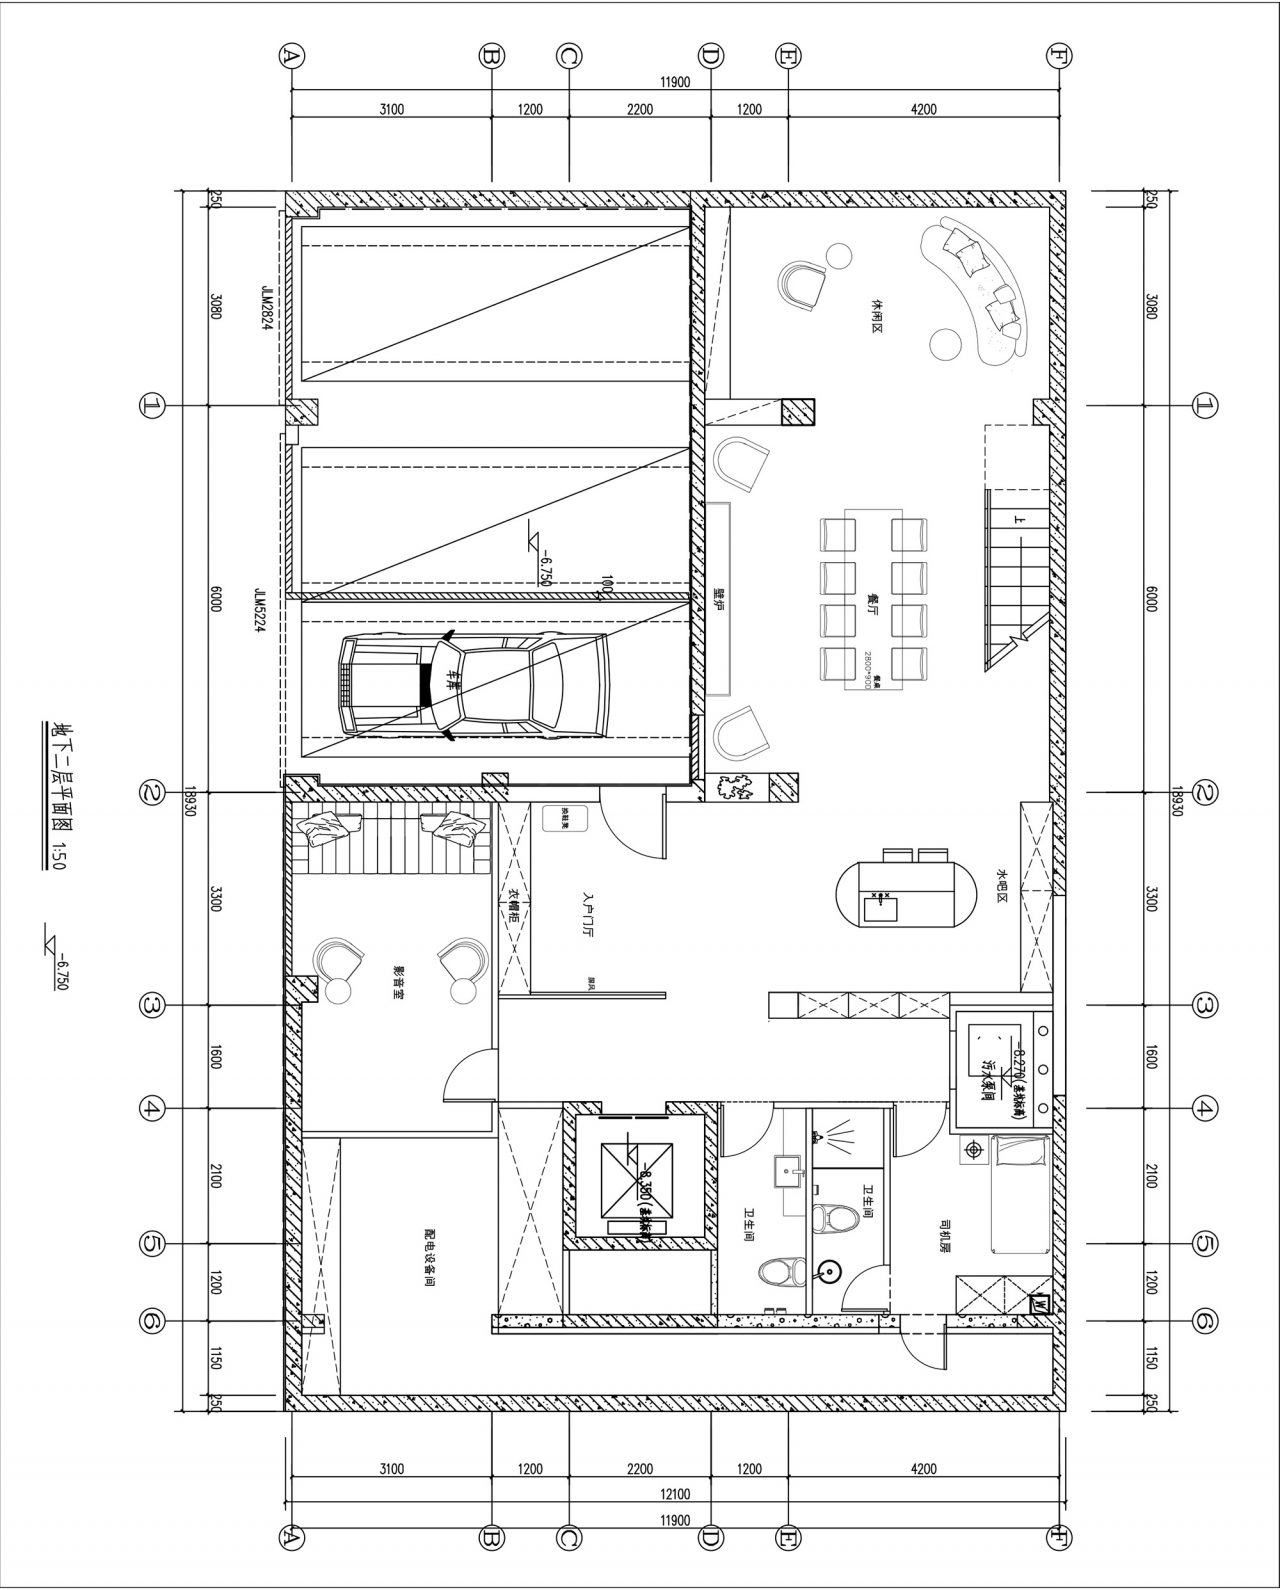 PLTadb0.tmp.pdf